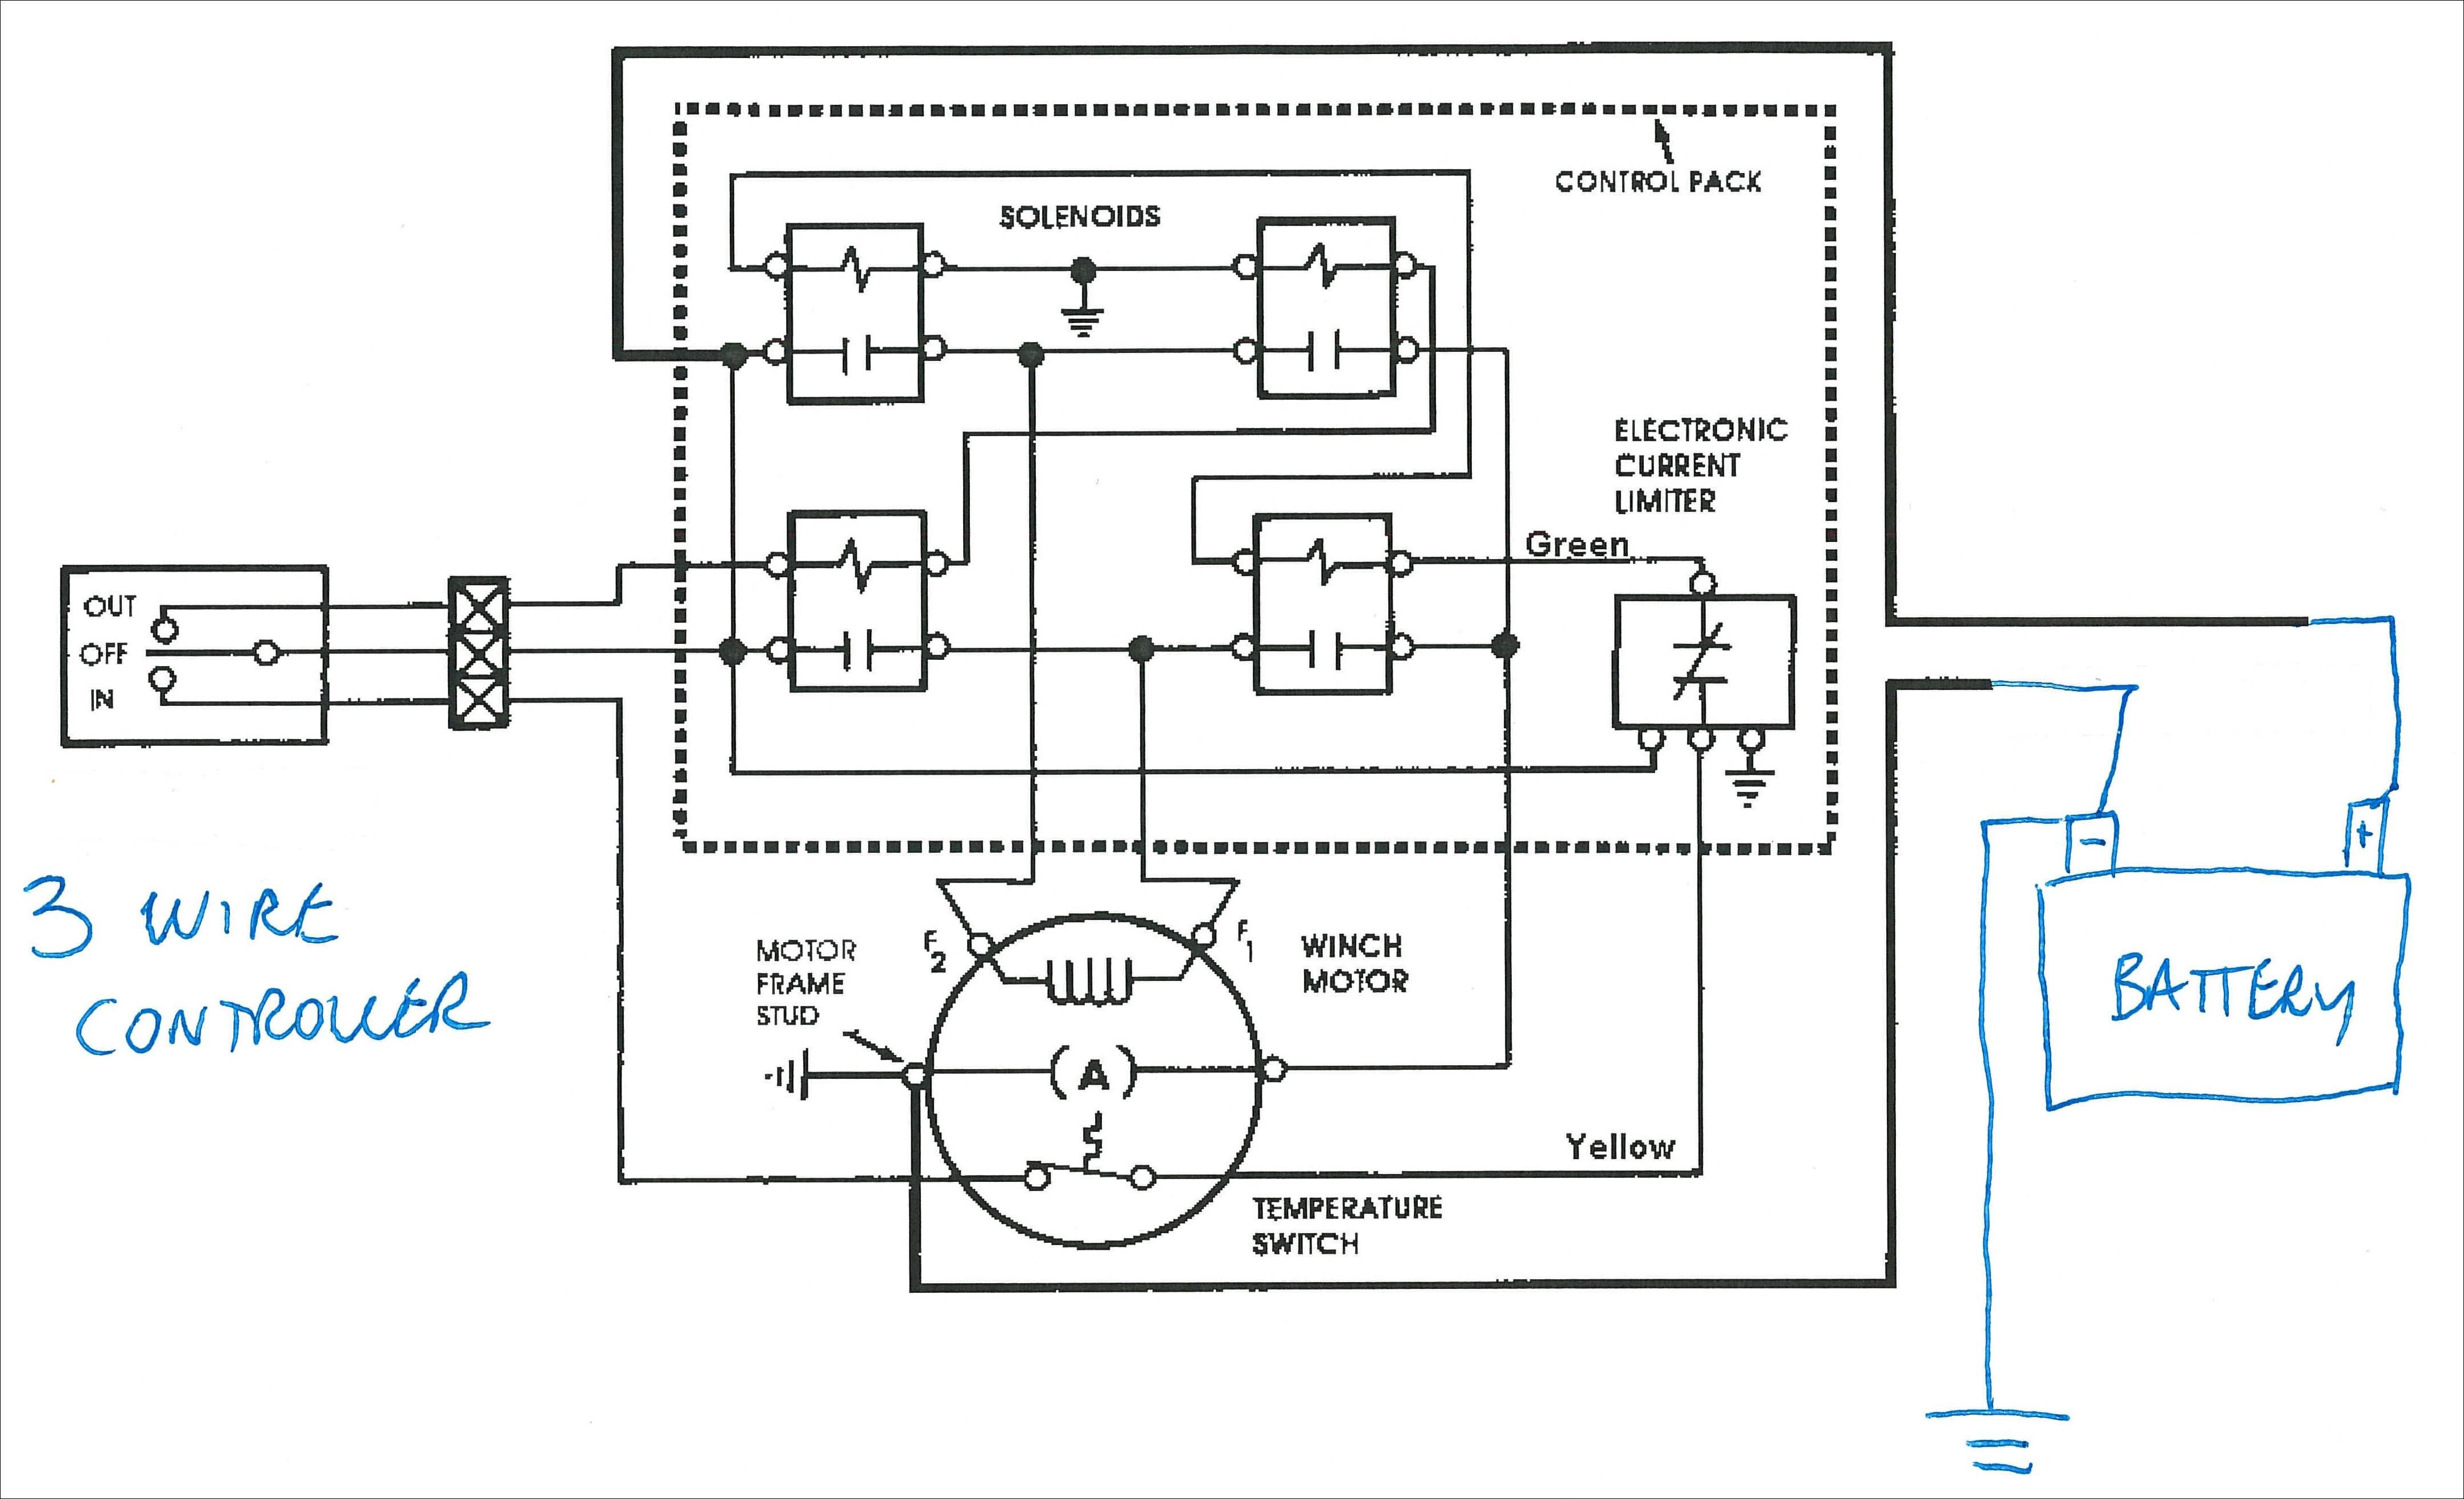 Warn Diagram Wiring Winch 1500 | Wiring Library - Warn Winch Wiring Diagram 4 Solenoid